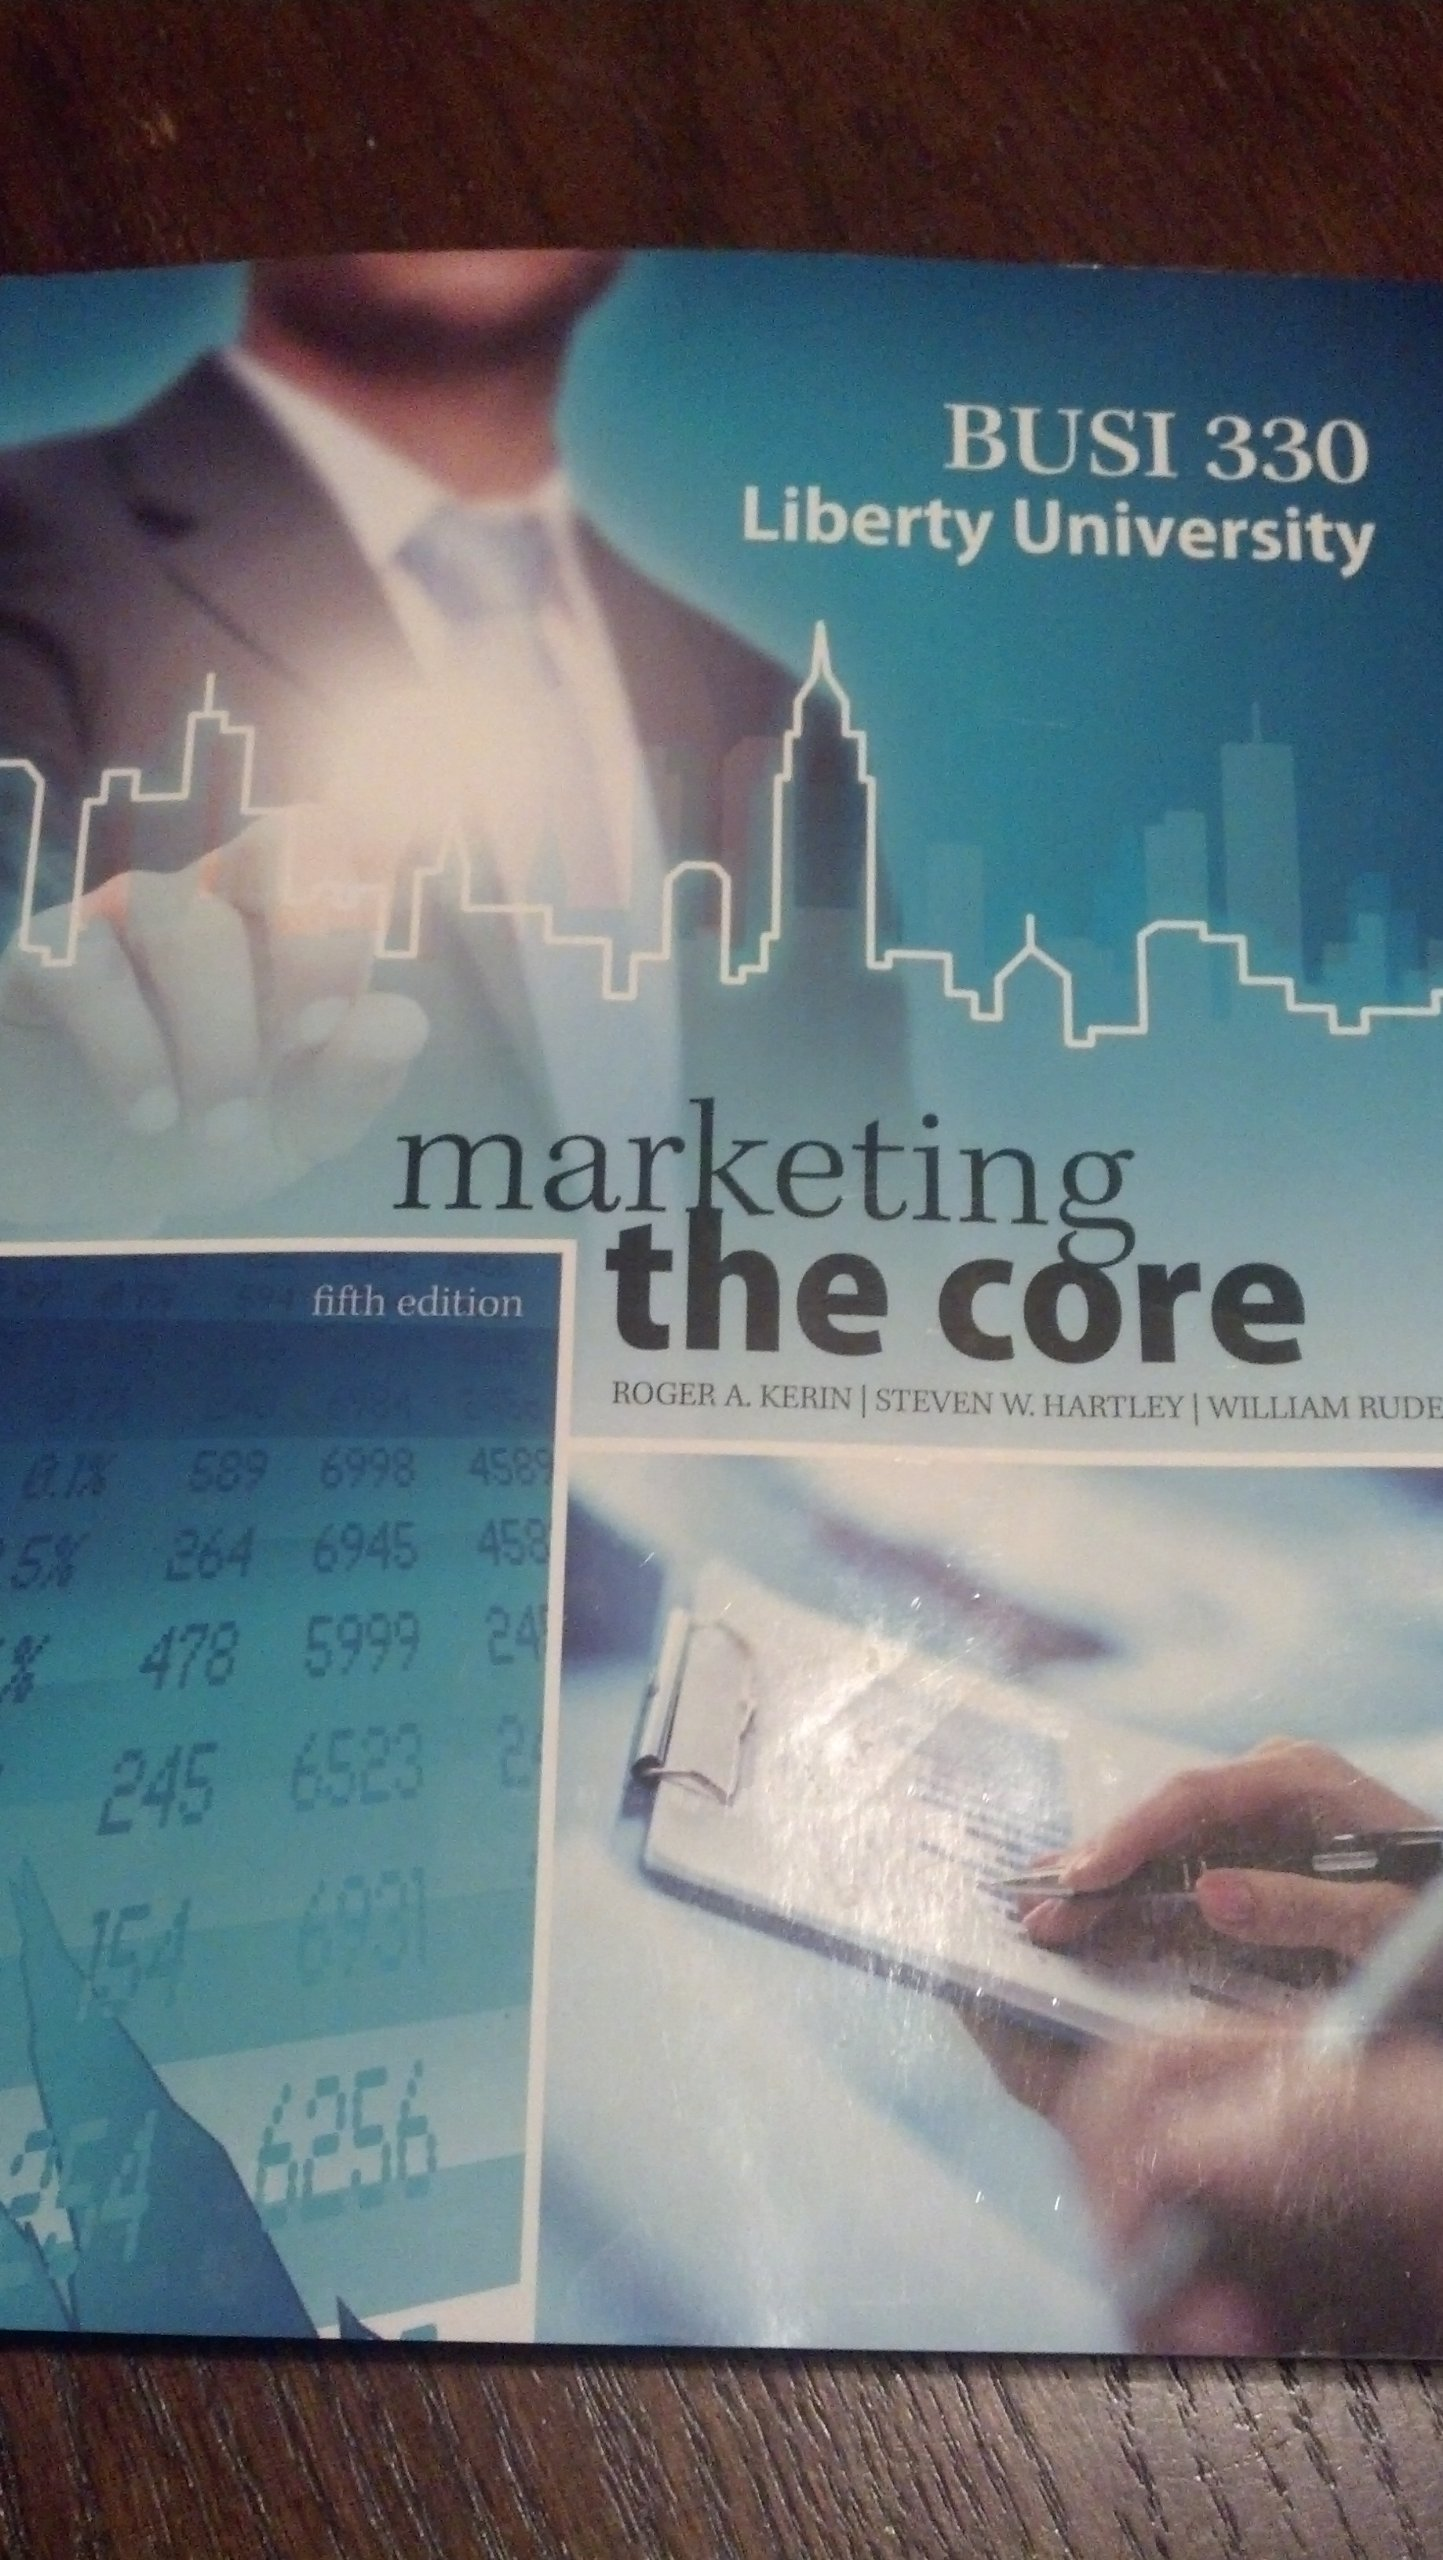 Read Online Liberty University Busi 330 Revised Marketing the Core PDF